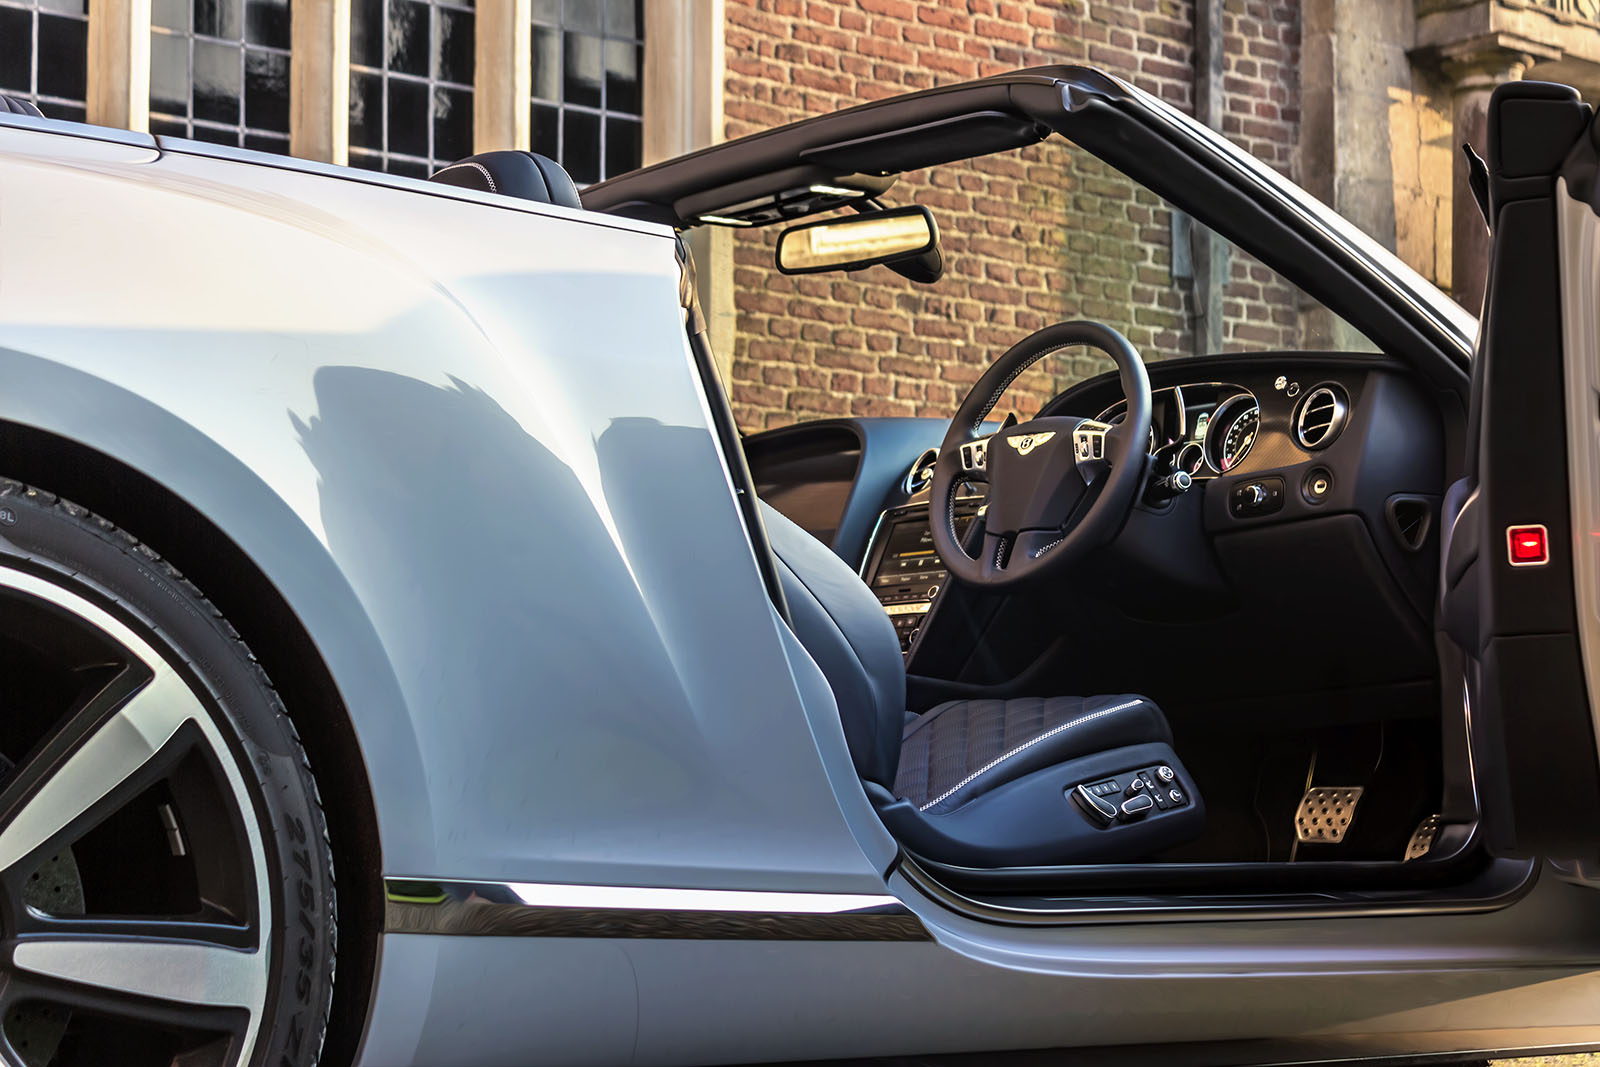 Top Down in The Bentley GTC V8S 5